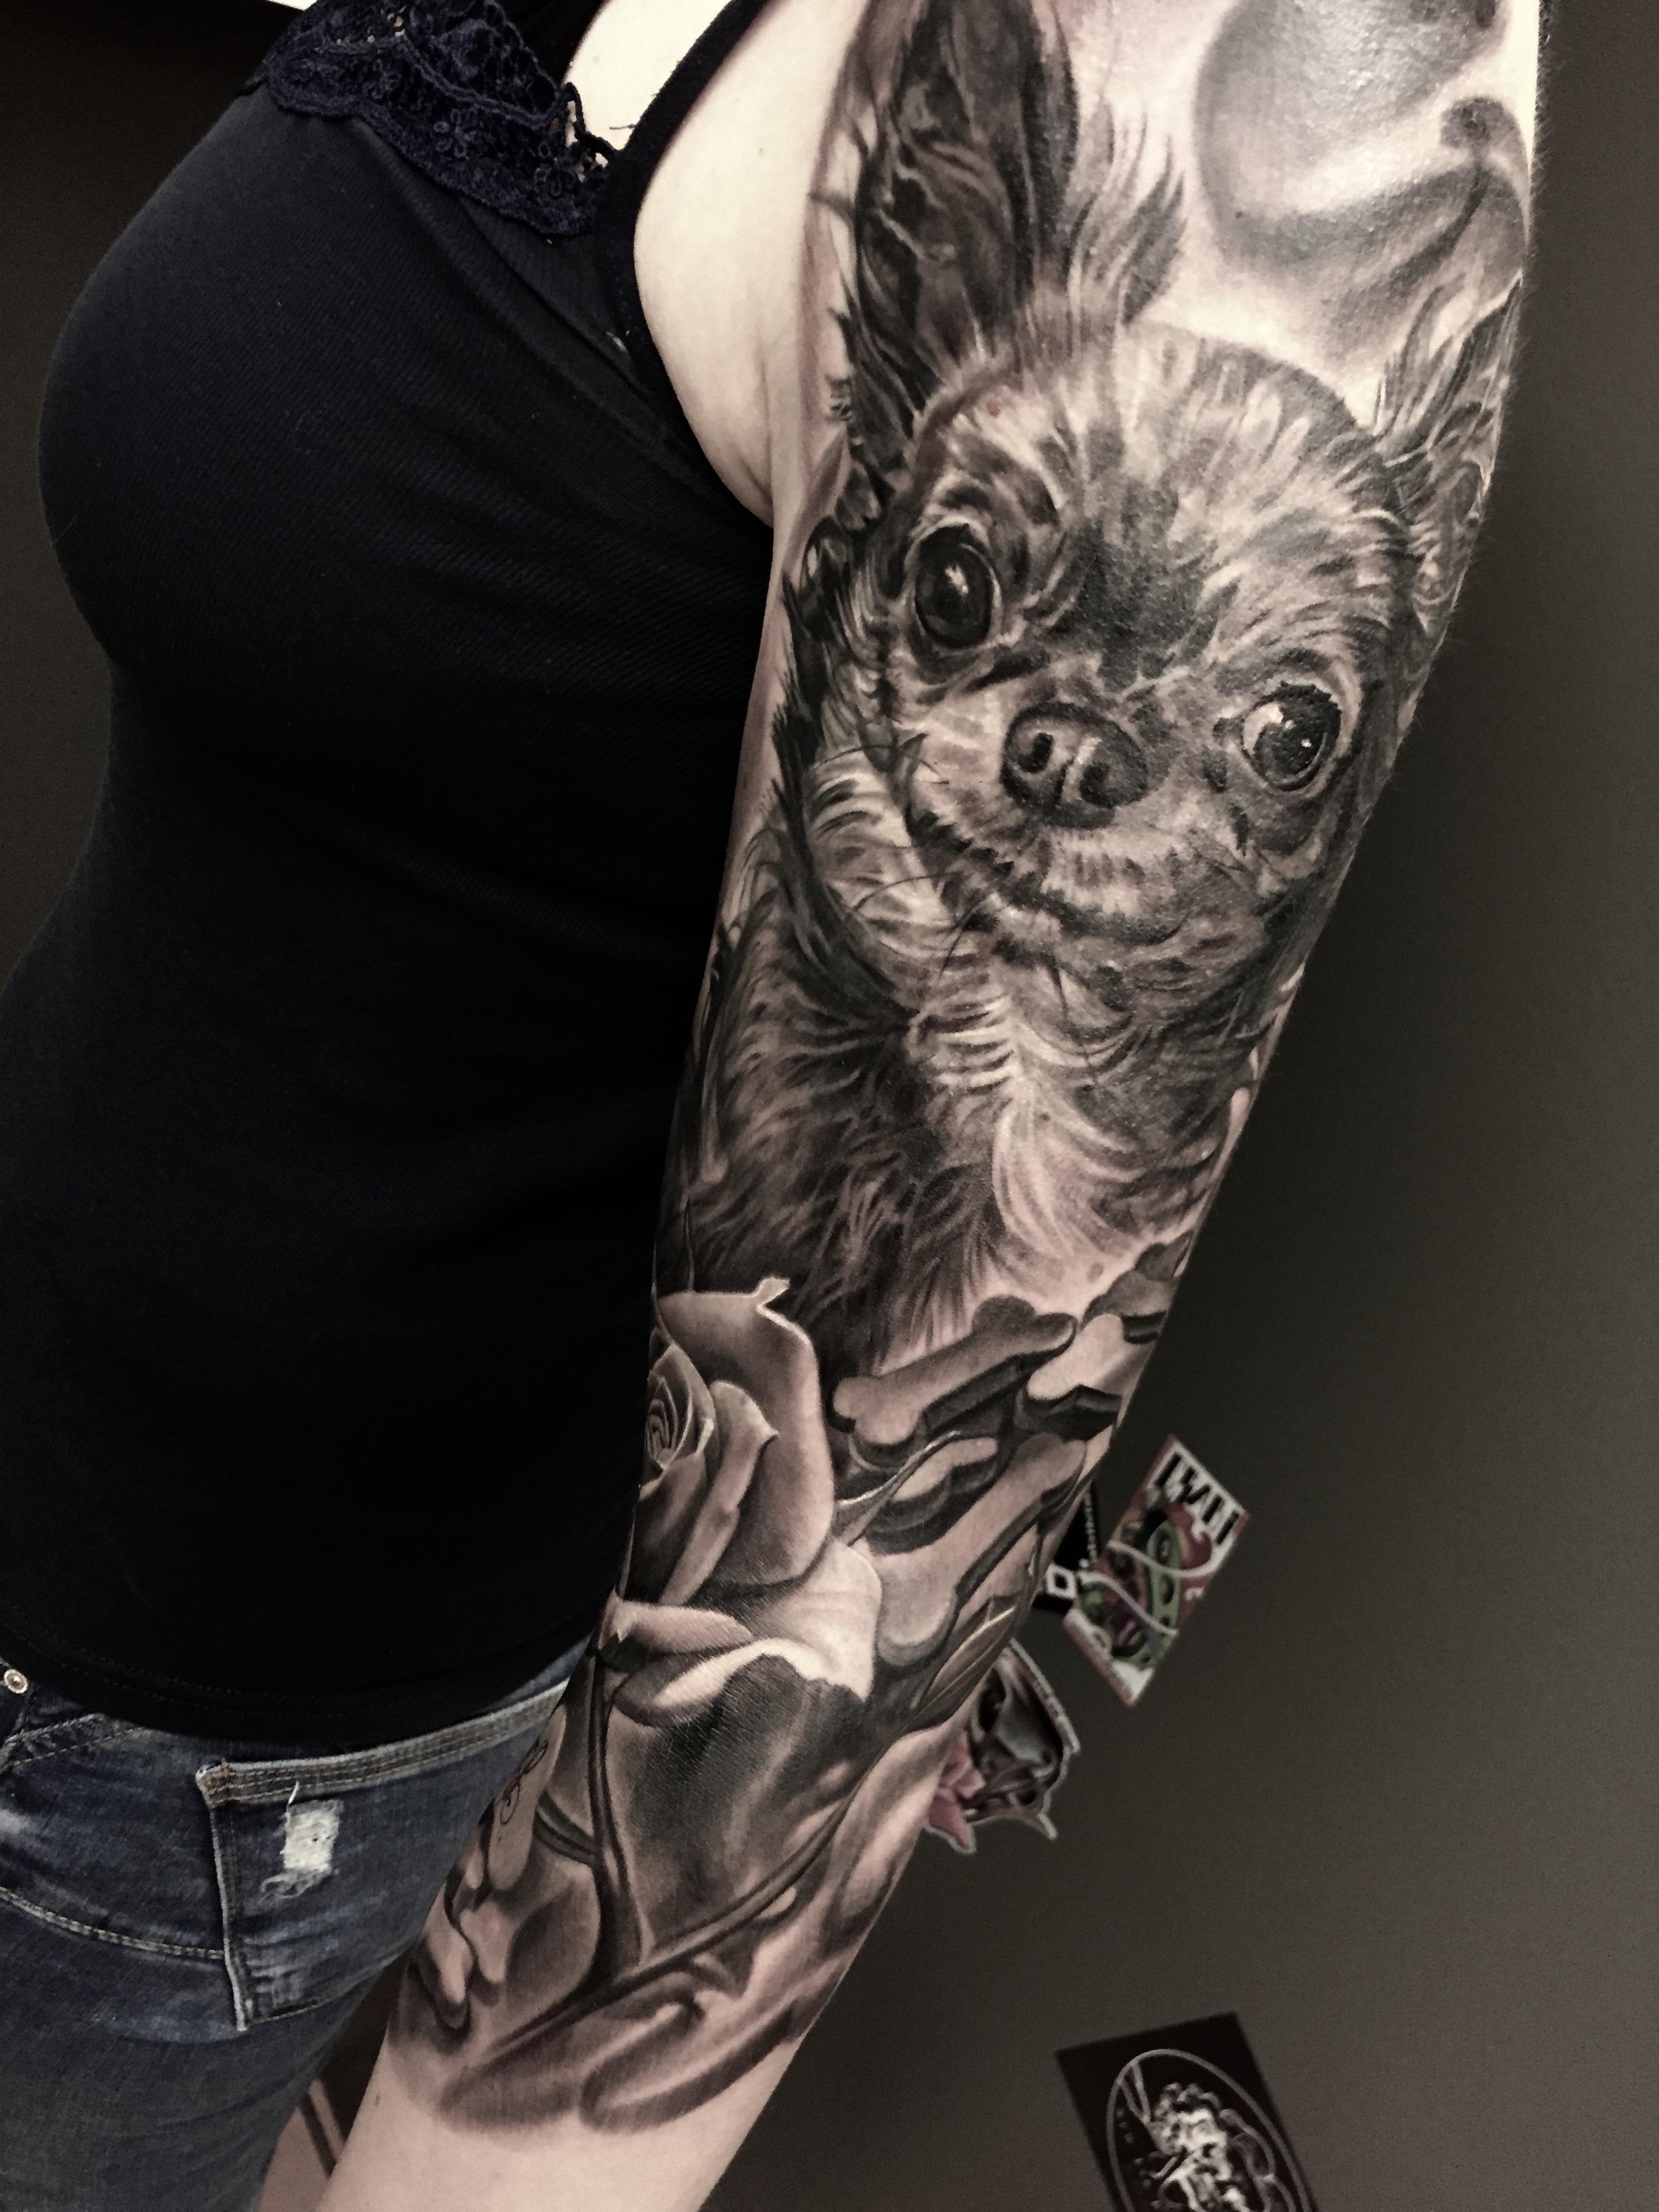 chiwawa,dog, portrait, realismus, electrographic tattoo,germany, bayern, rosenheim, münchen , salzburg , innsbruck, vogel, rose, tattoo, tattoo art, color, realistic 2